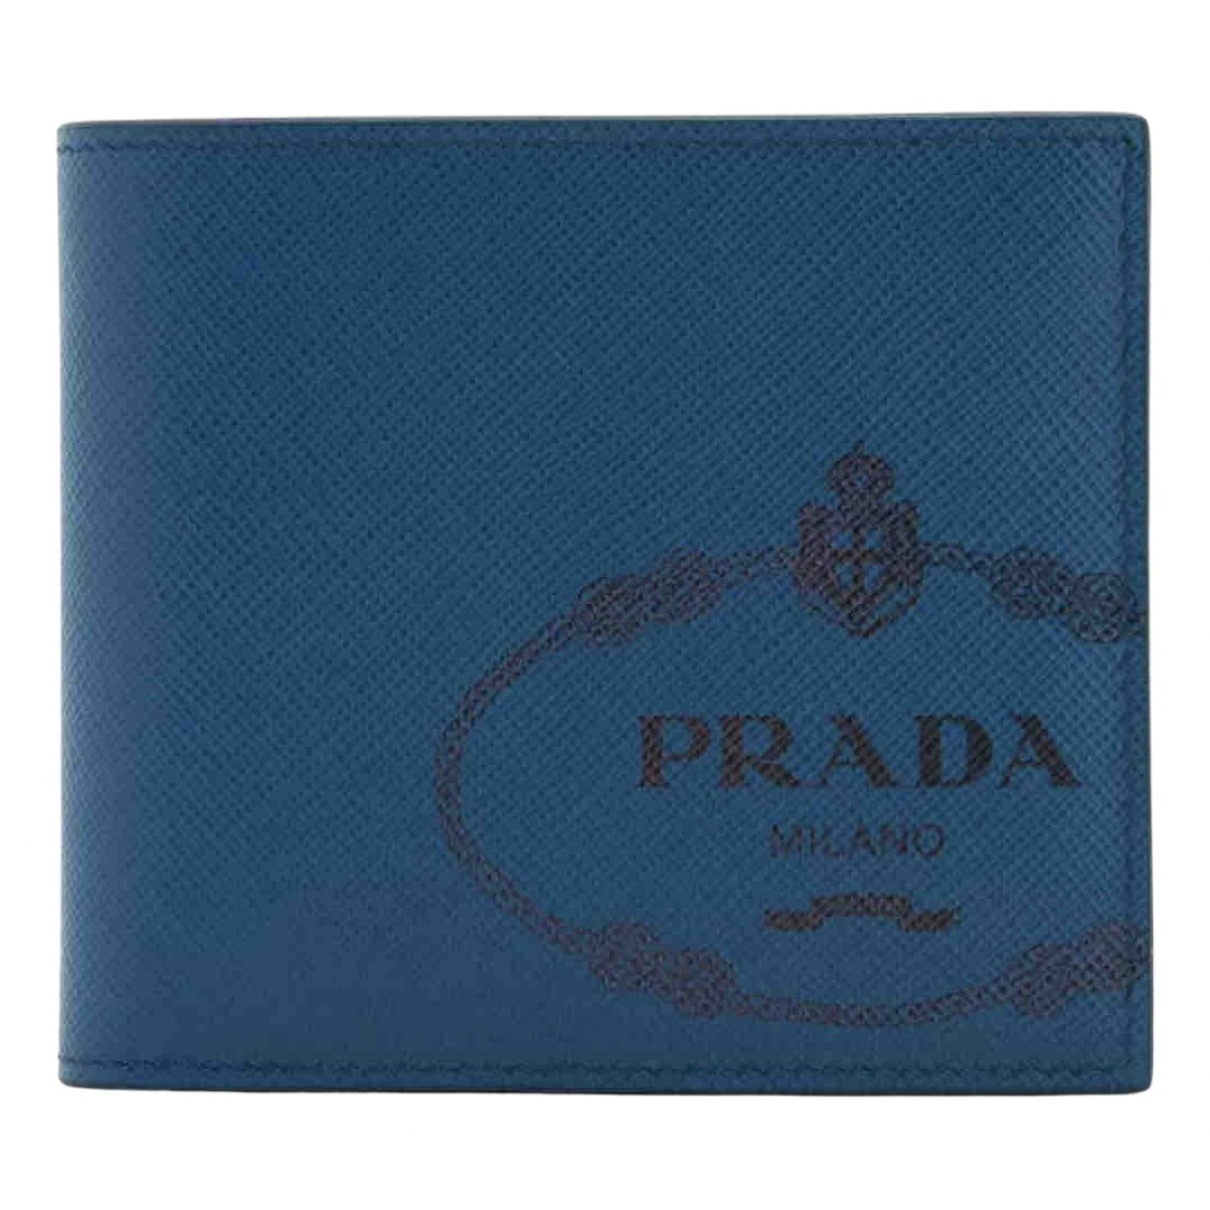 Prada N Blue Leather Small bag, wallet & cases for Men N